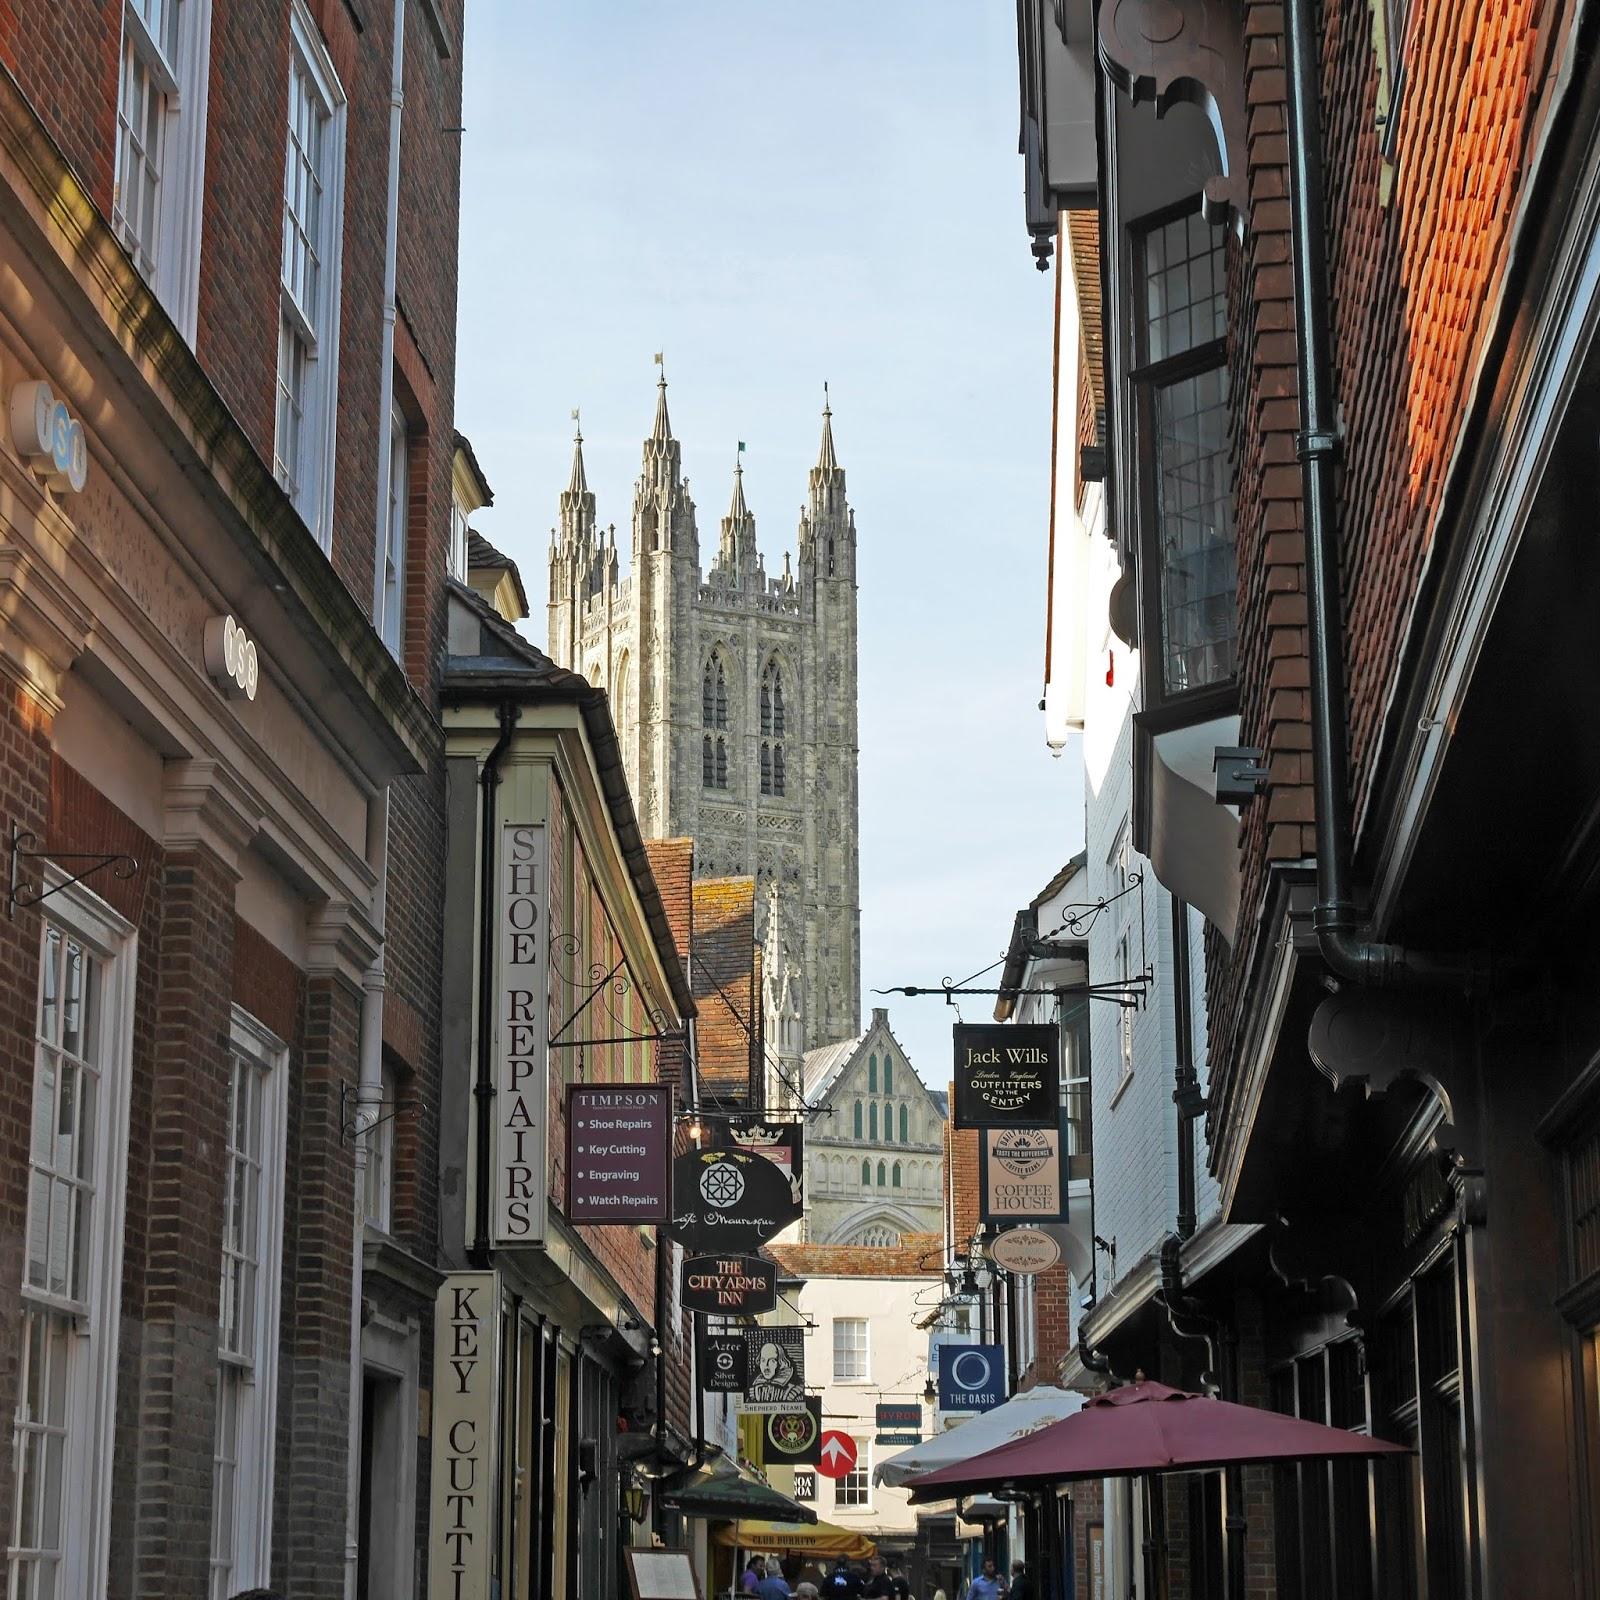 Butchery Lane in Canterbury, Kent